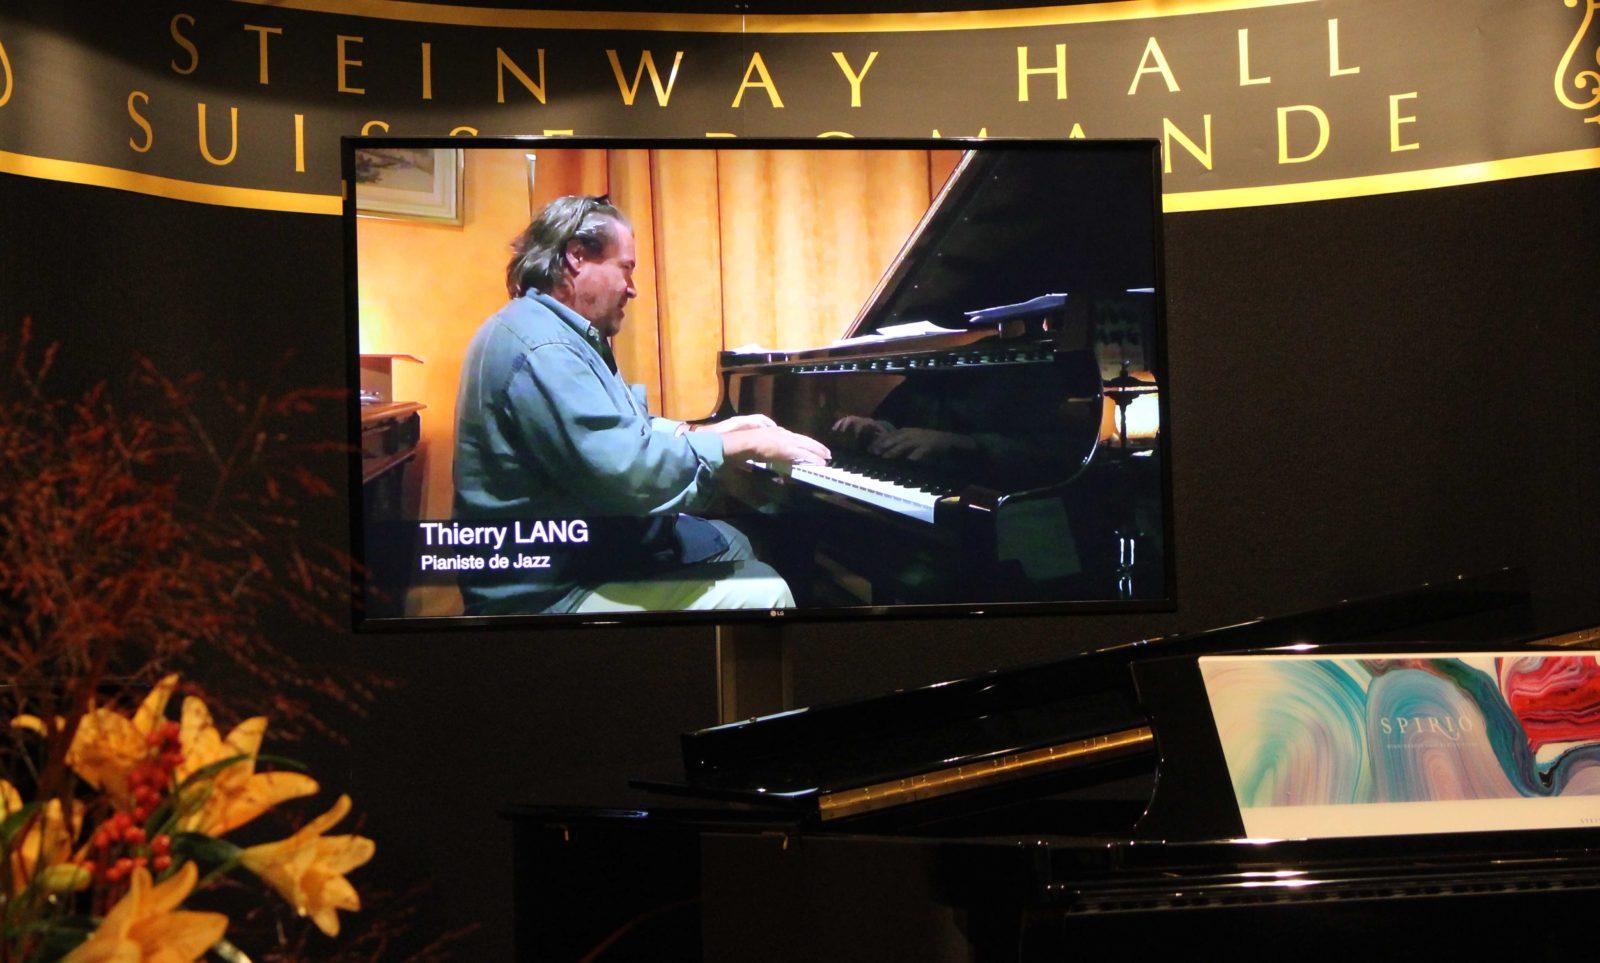 20ème anniversaire Steinway Hall Suisse Romande Thierry Lang